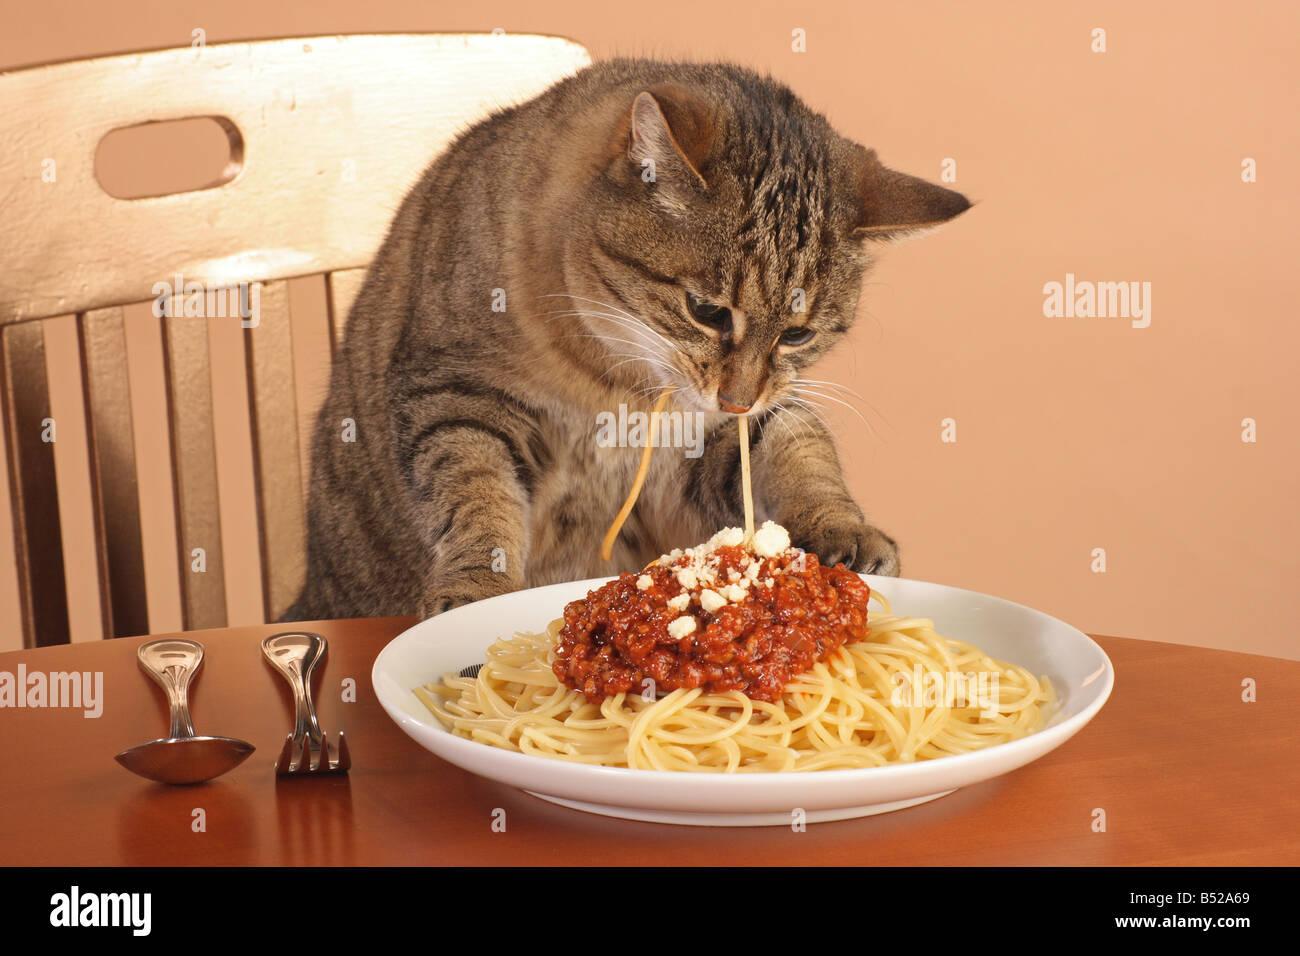 Older cats eating habits